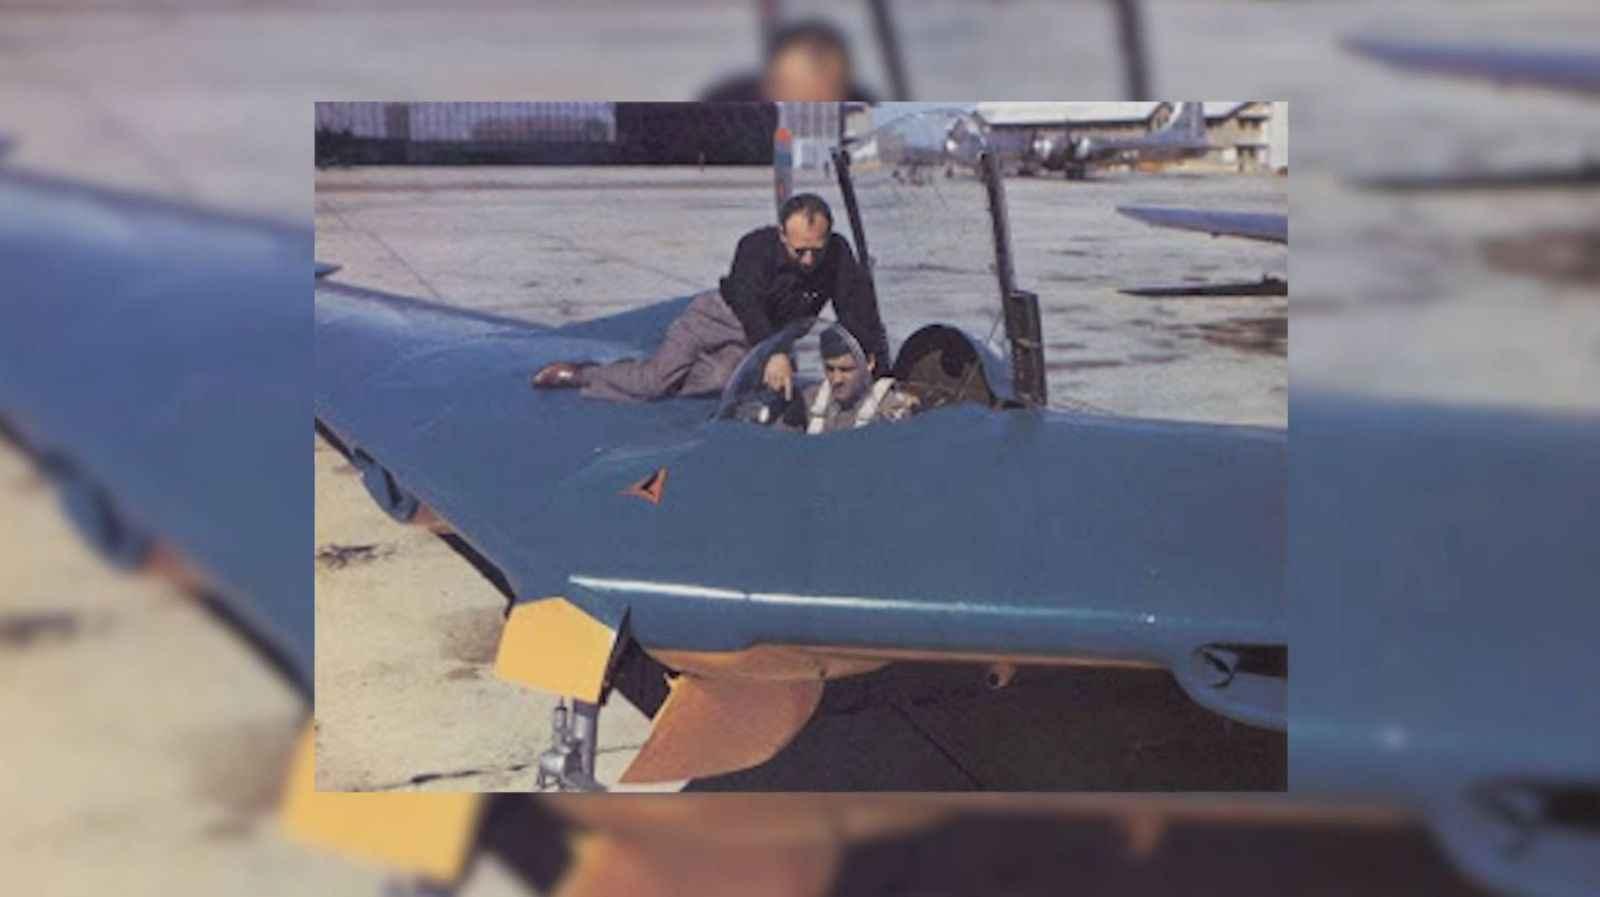 11_test_pilot_in_blue_Flying_Wing.jpg